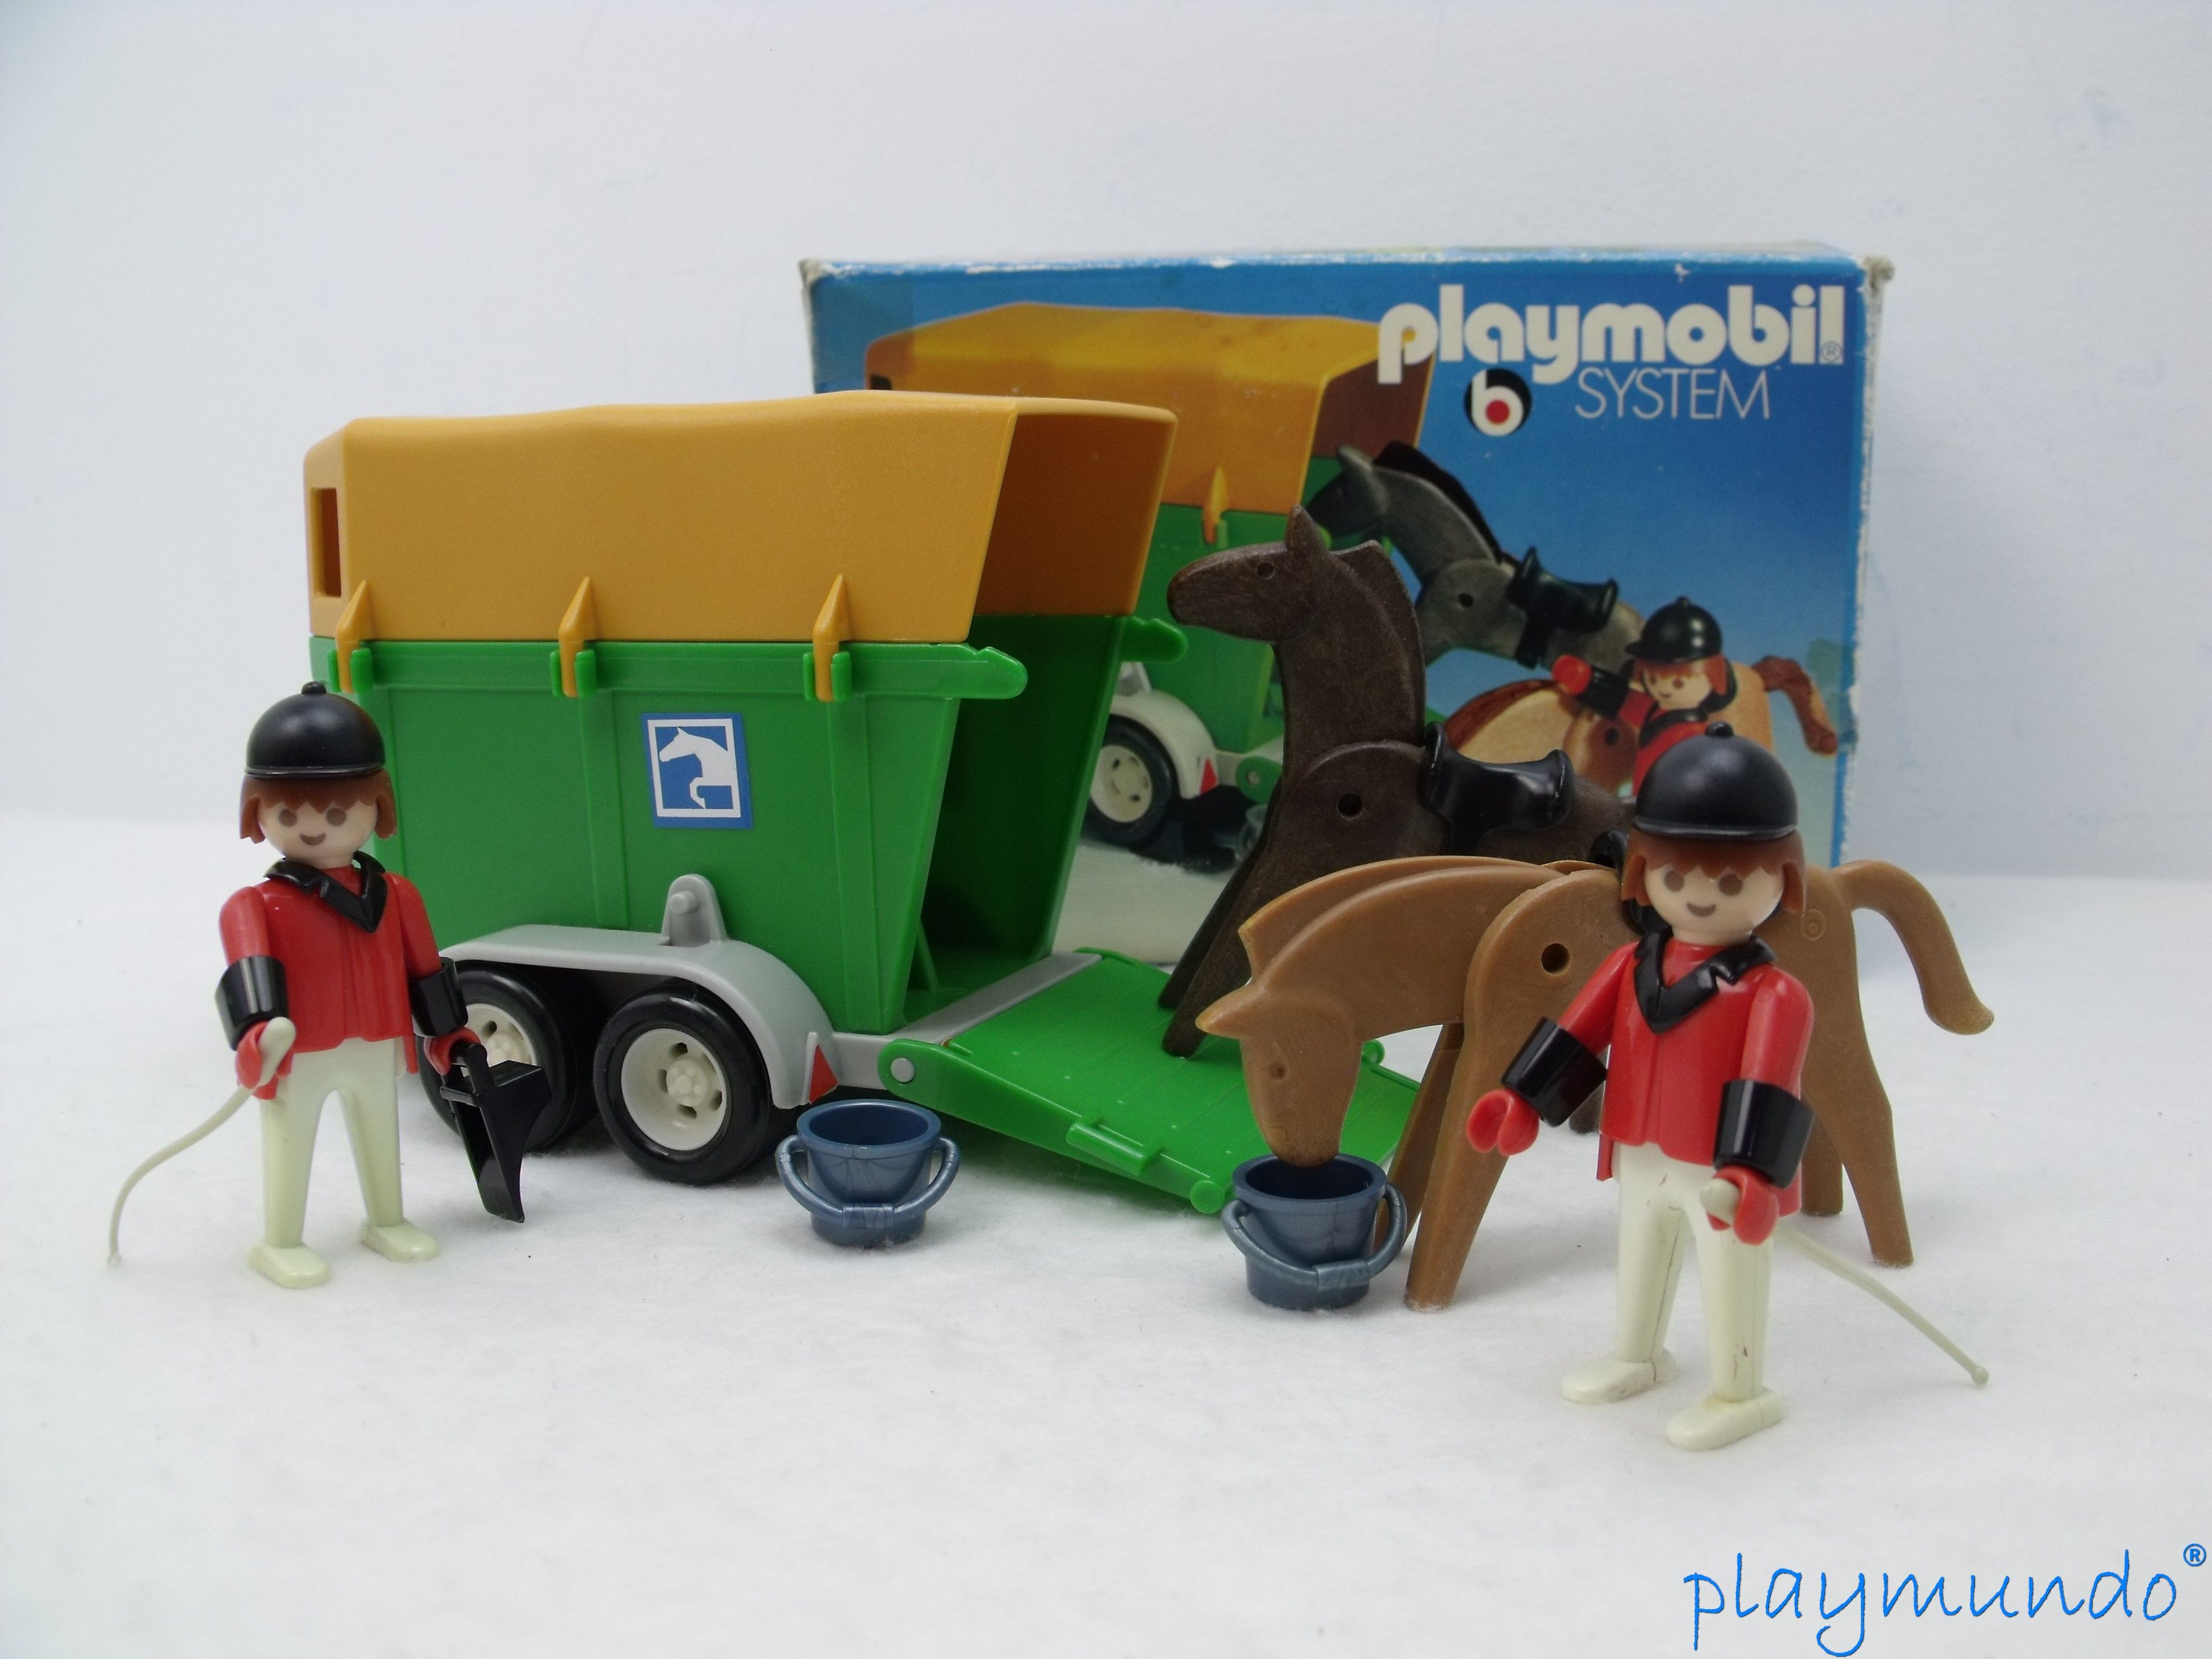 Playmobil babyzimmer ~ Playmobil remolque hipica playmundo